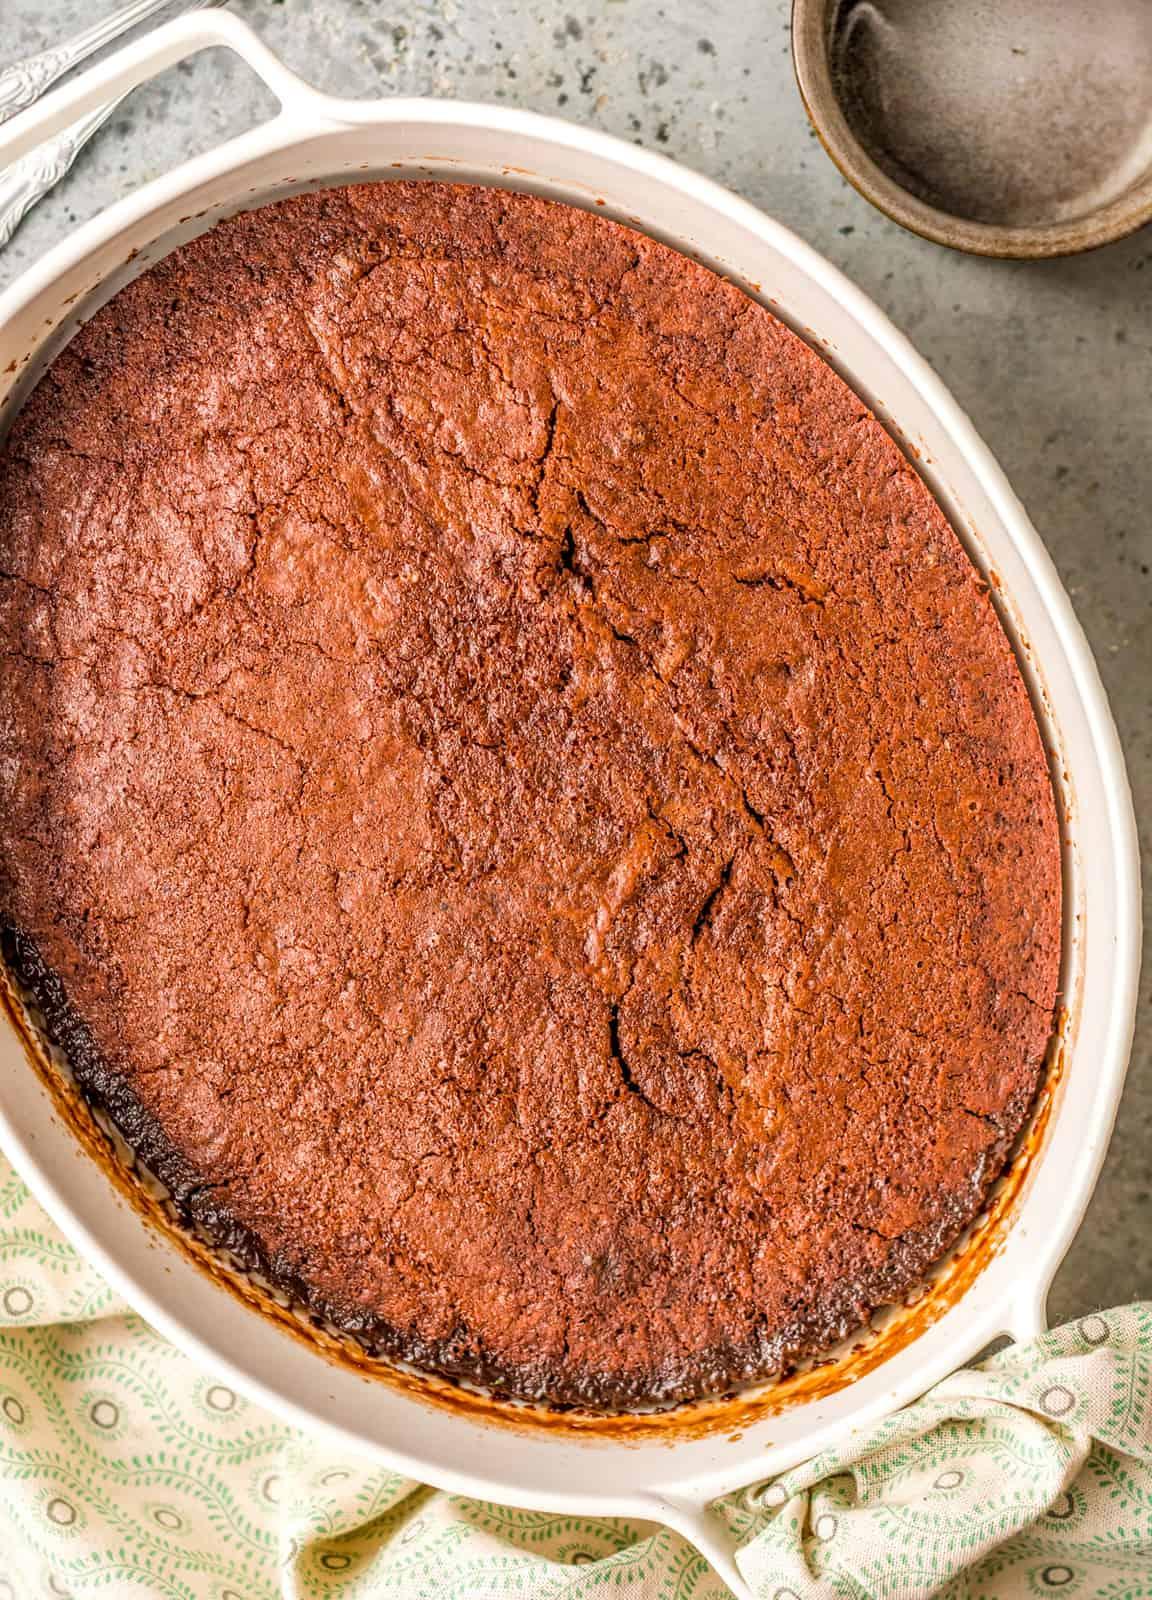 Finished cake in baking dish